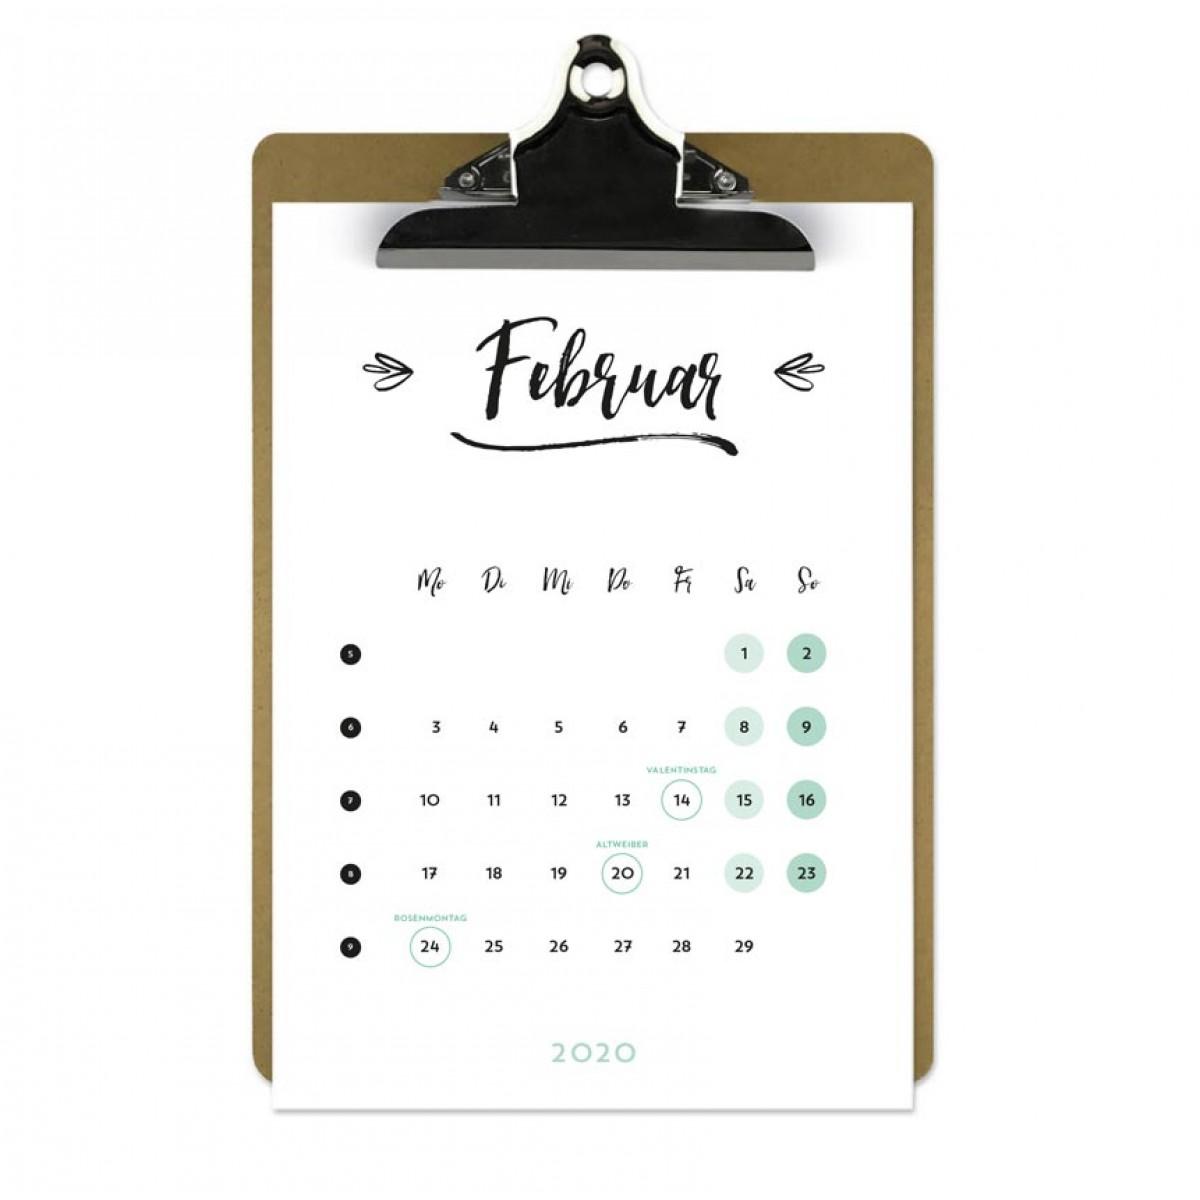 Jahresplaner 2020 mit Klemmbrett | Farbe: Rosa